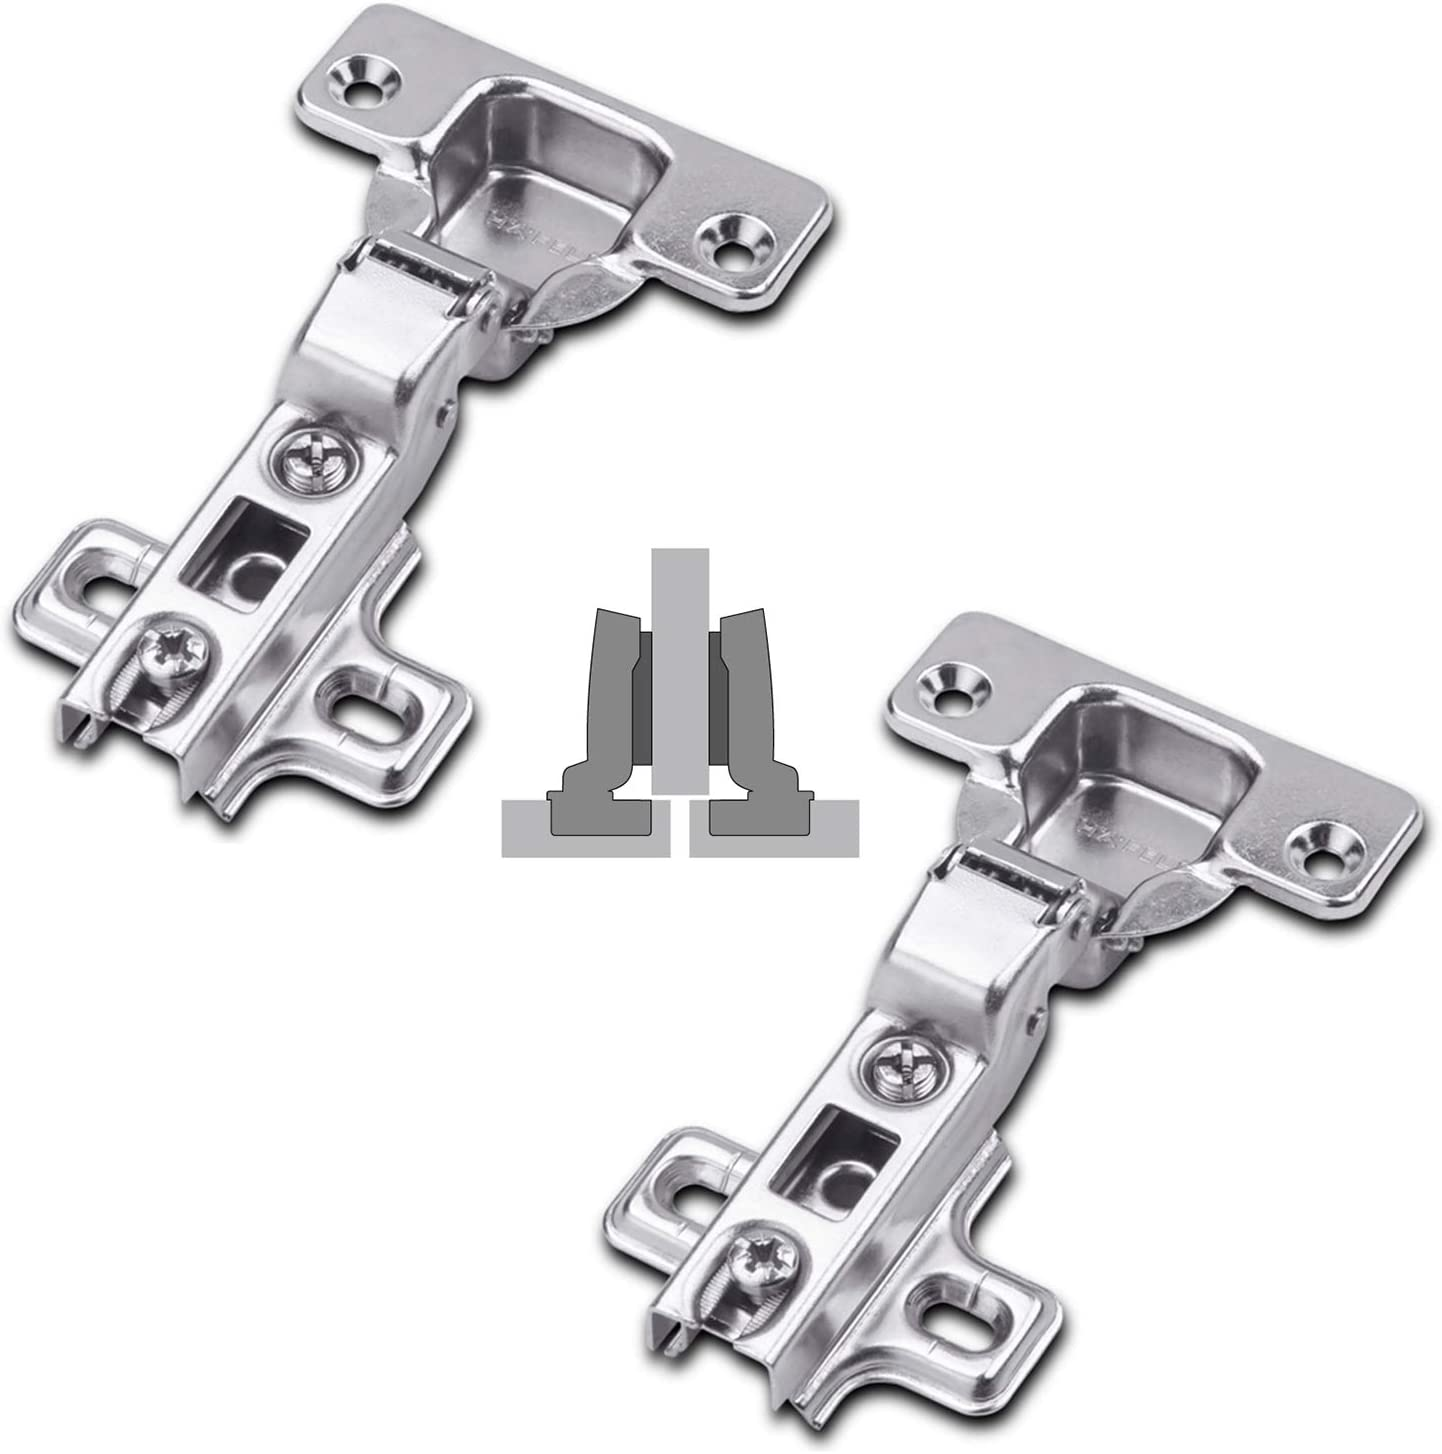 4x Bisagras de cazoleta rectas apertura 110/° para puerta de muebles C41037 AERZETIX